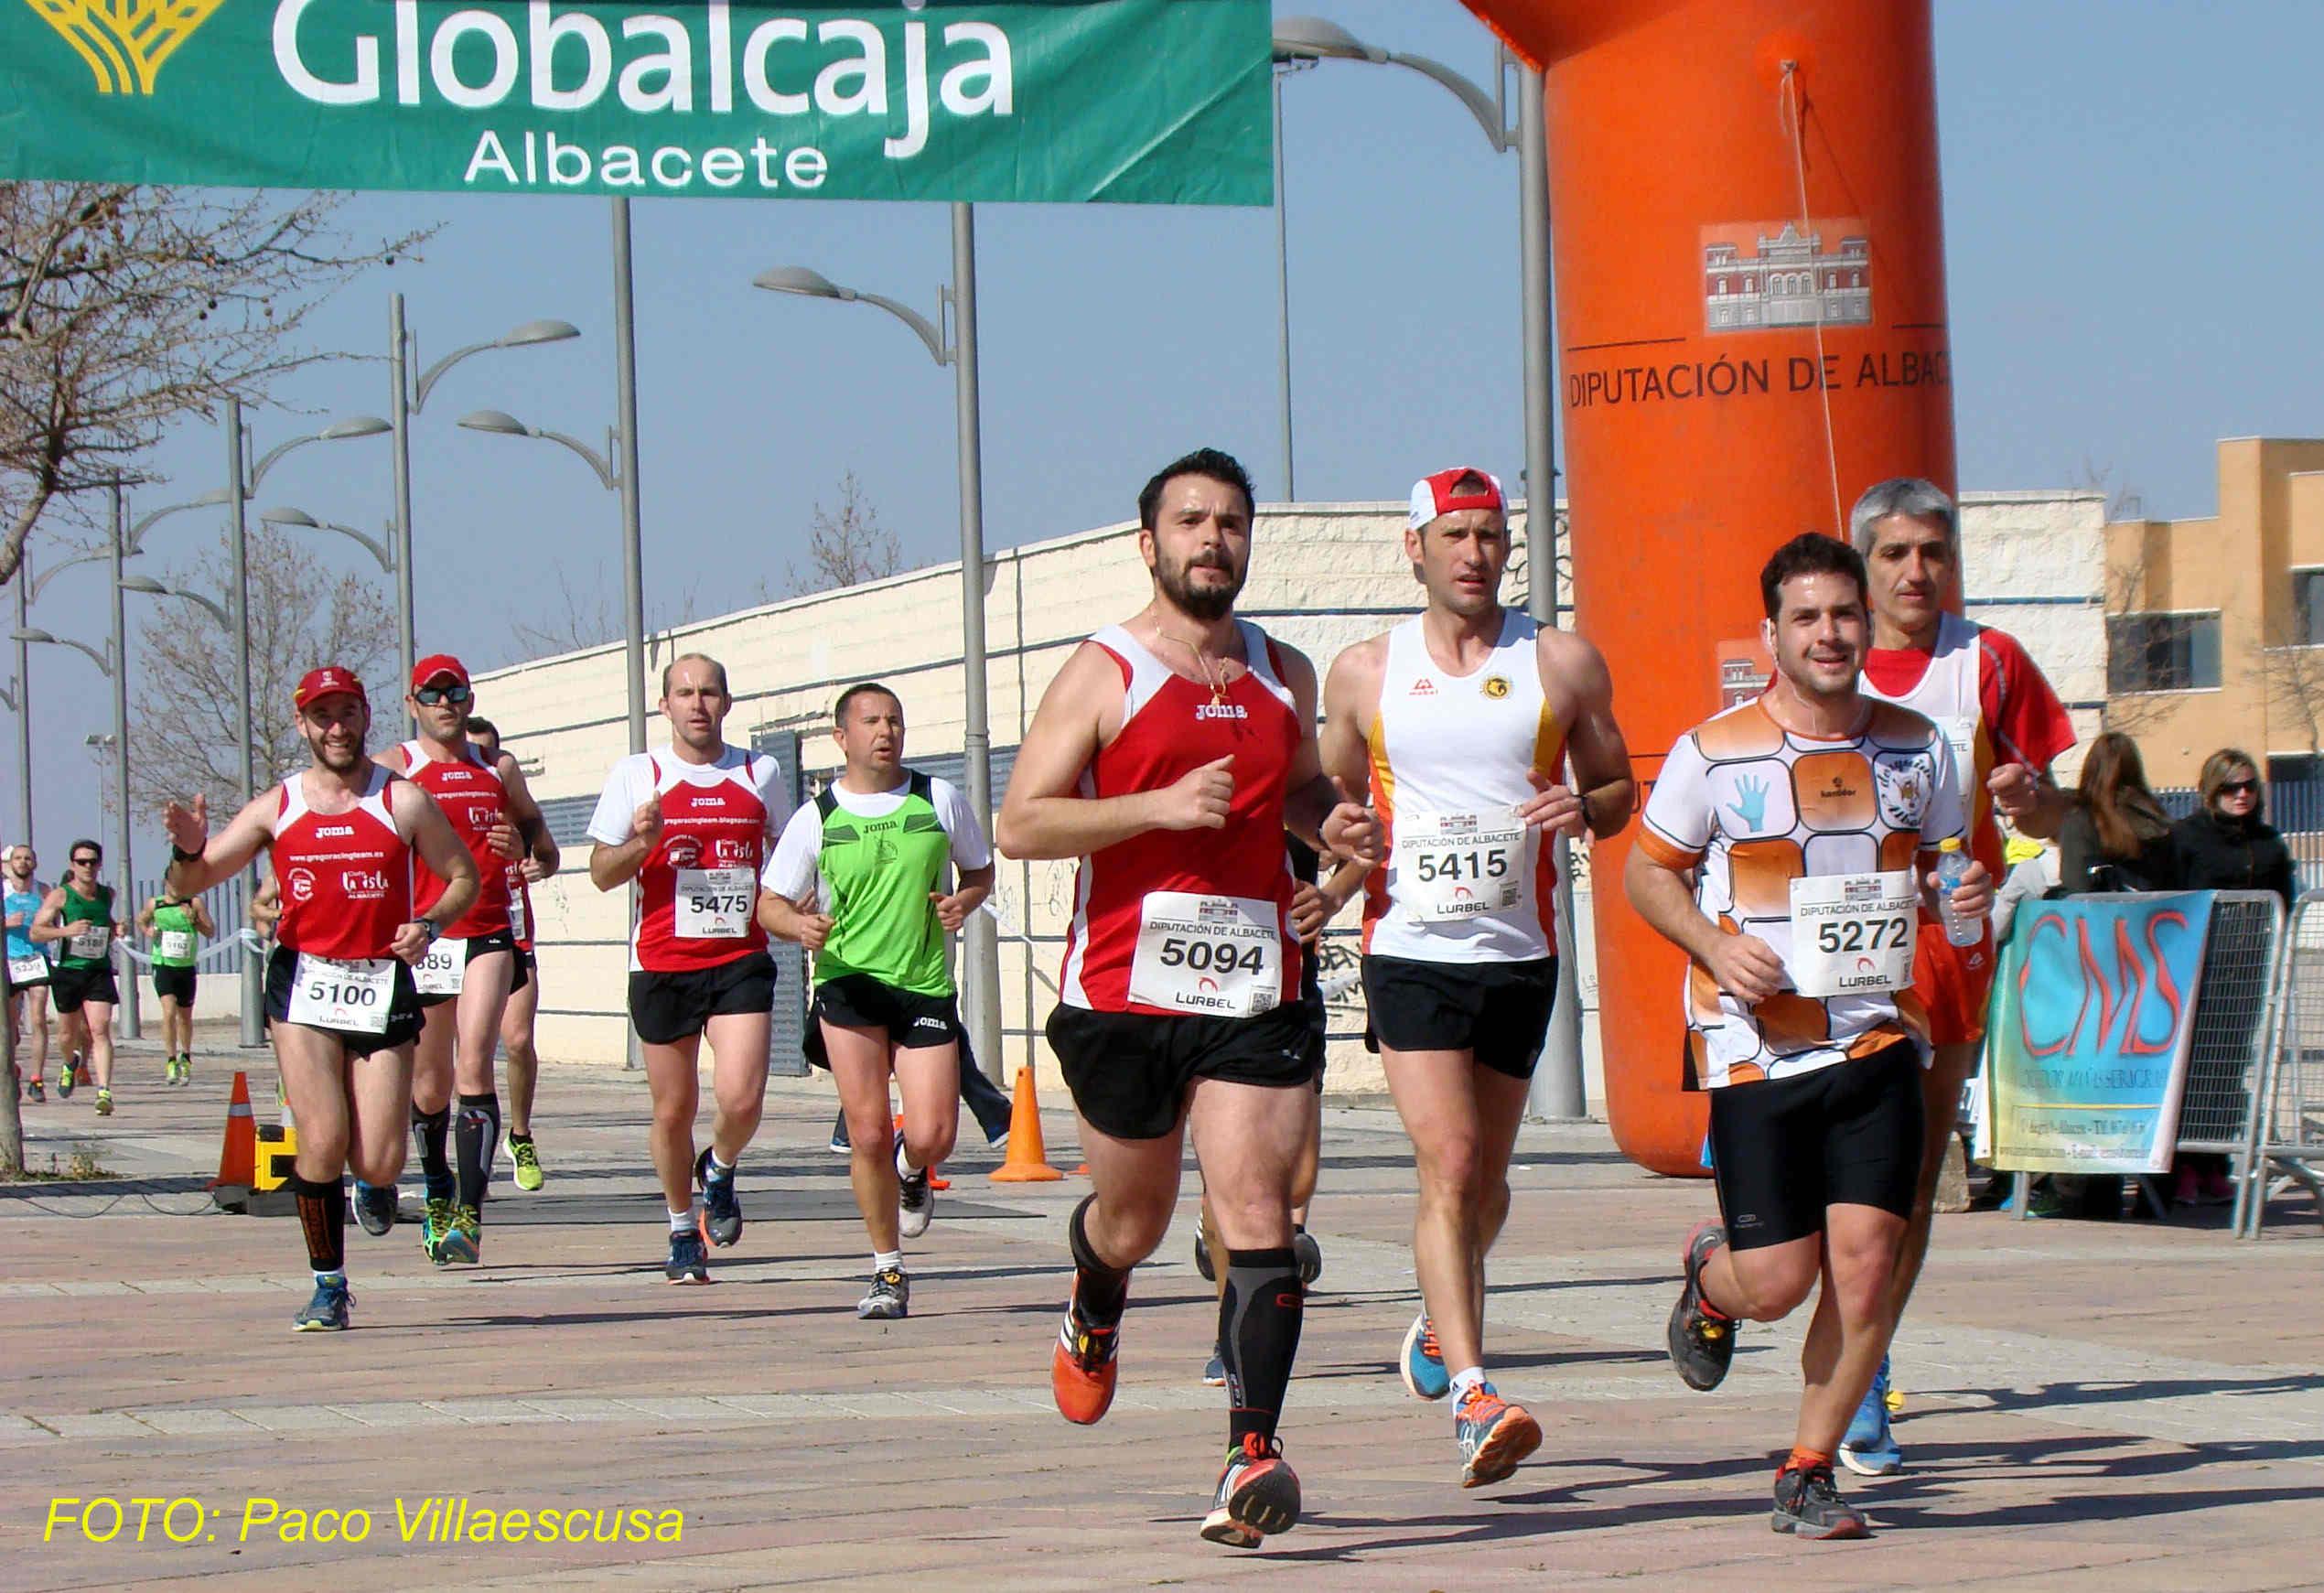 Atletas populares en Villarrobledo 2 (Foto: Paco Villaescusa)